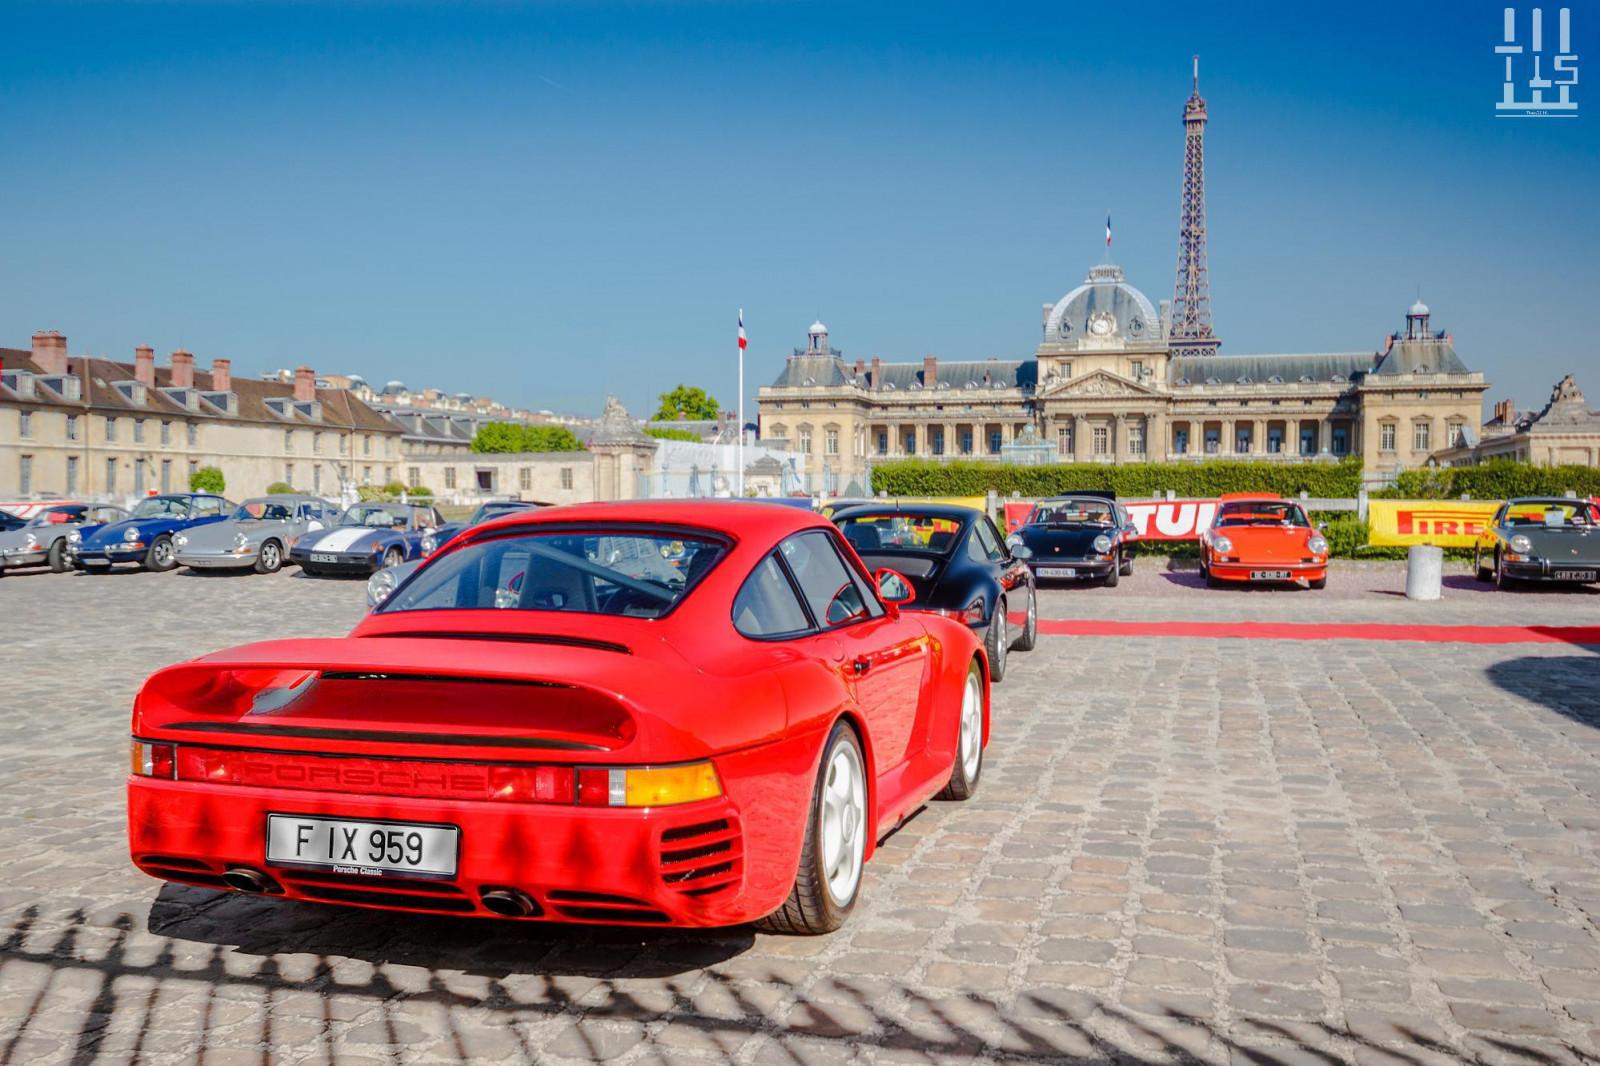 Wallpaper : old, sport, red, vehicle, road, Porsche, luxury, Paris ...